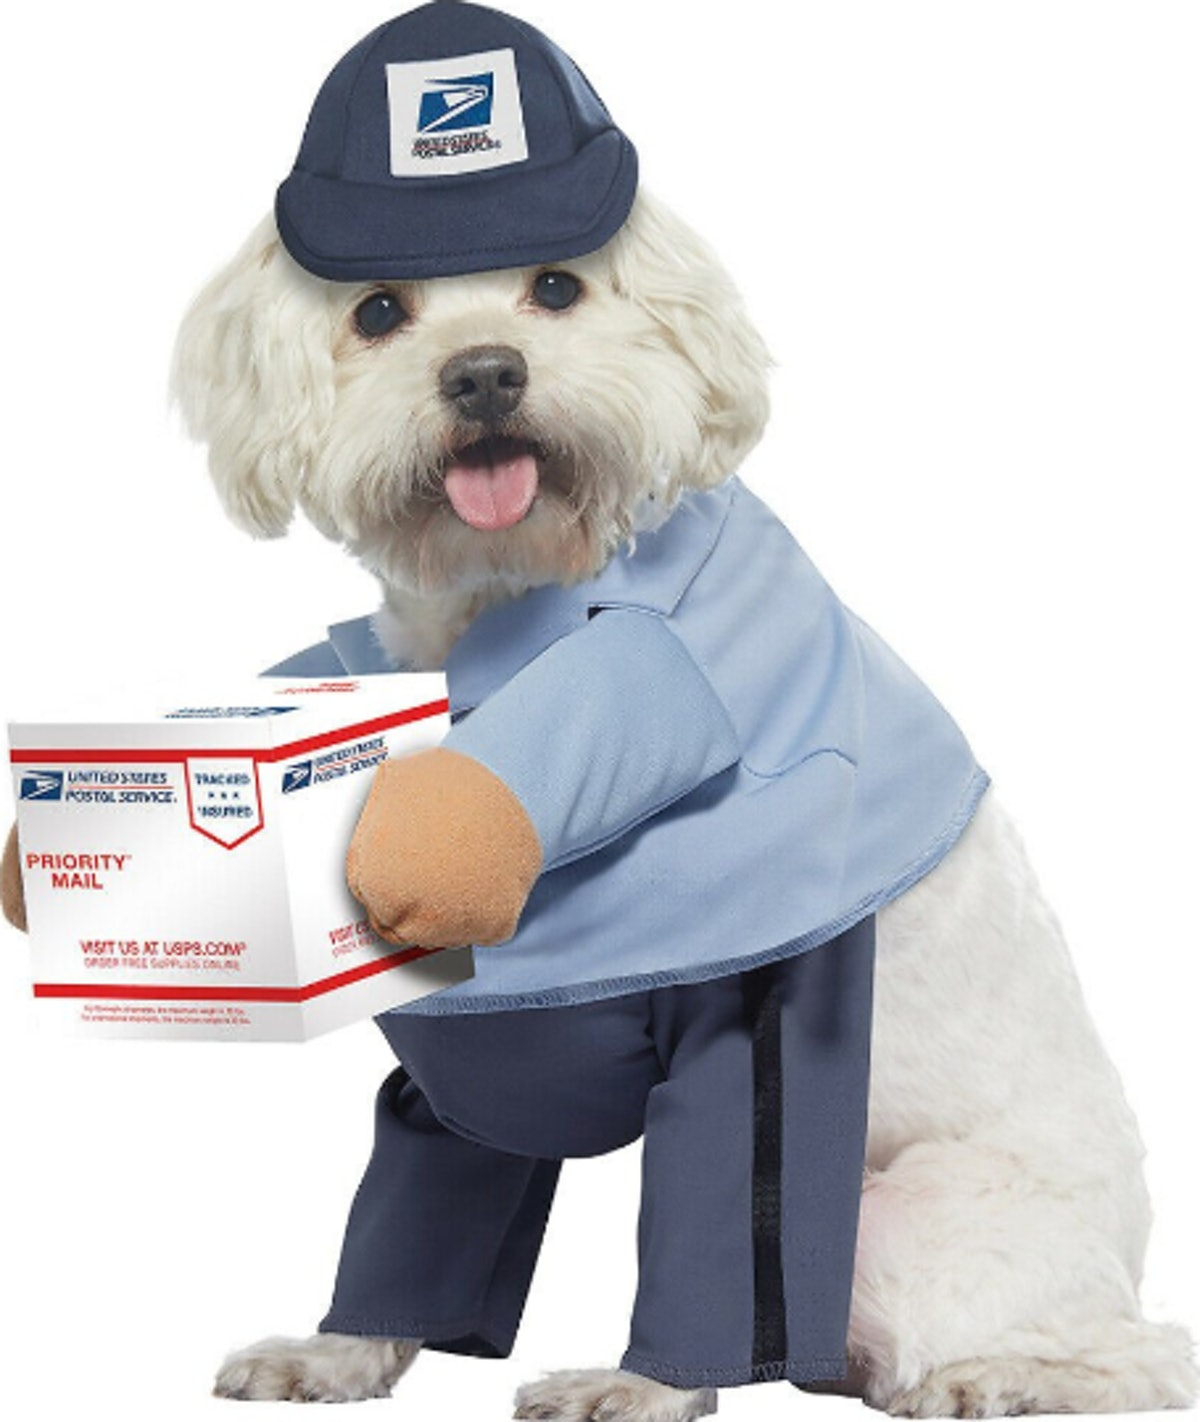 USPS Delivery Driver Dog Costume